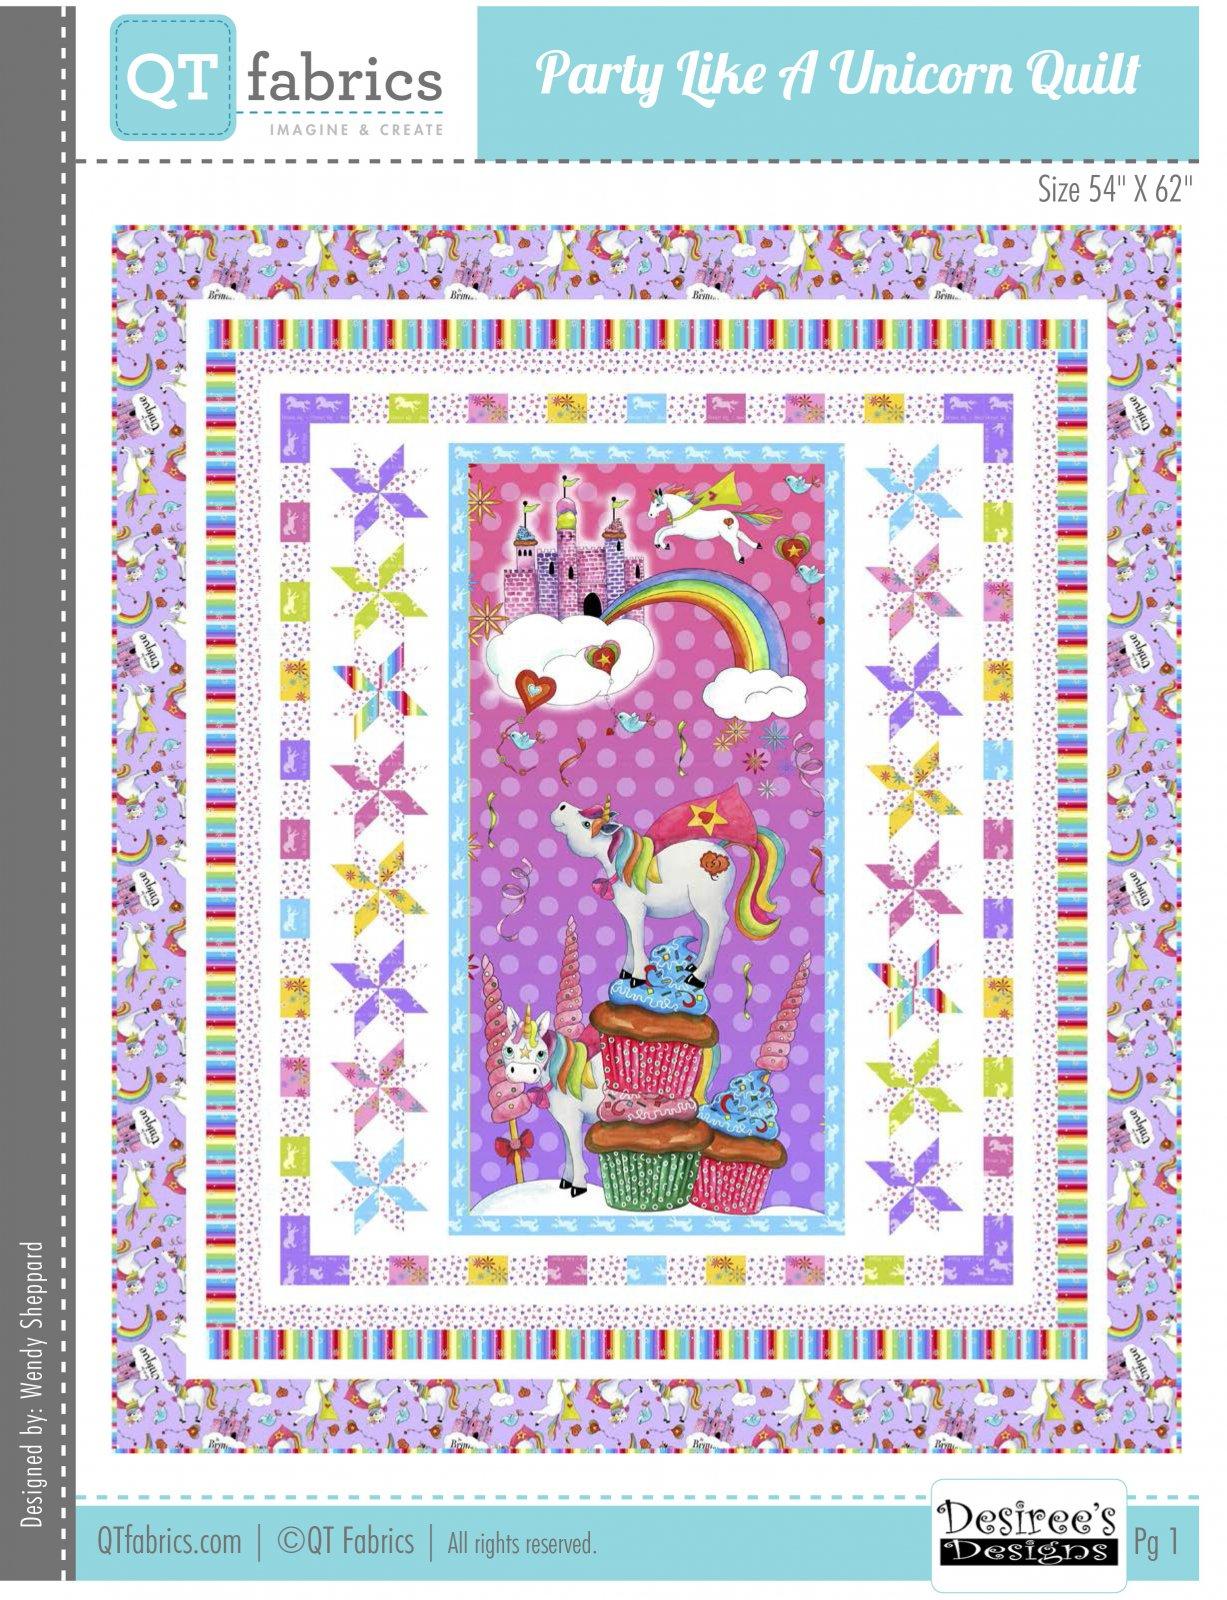 Party Like a Unicorn Free Downloadable Pattern